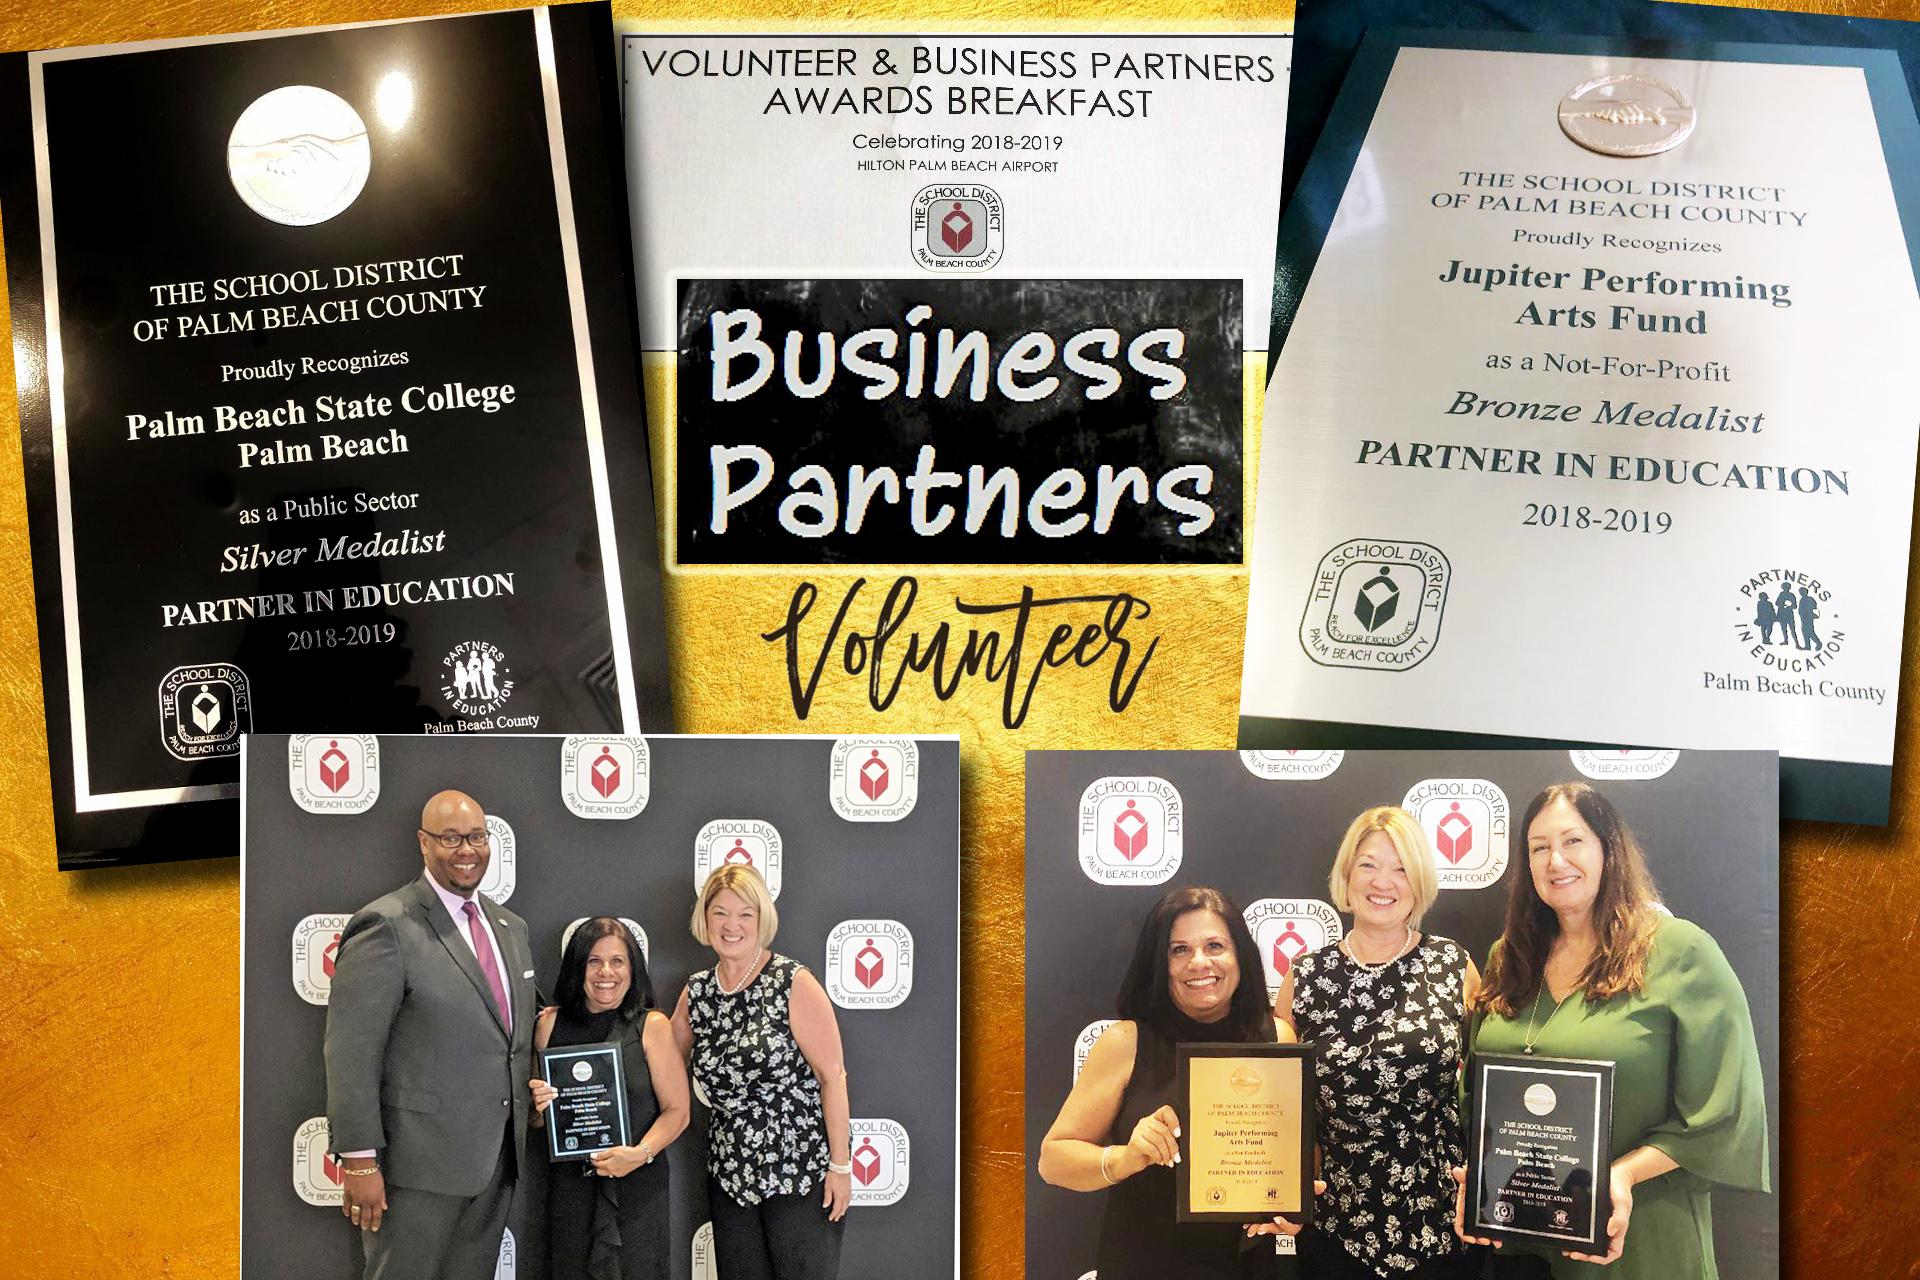 Business Partner Win Awards!